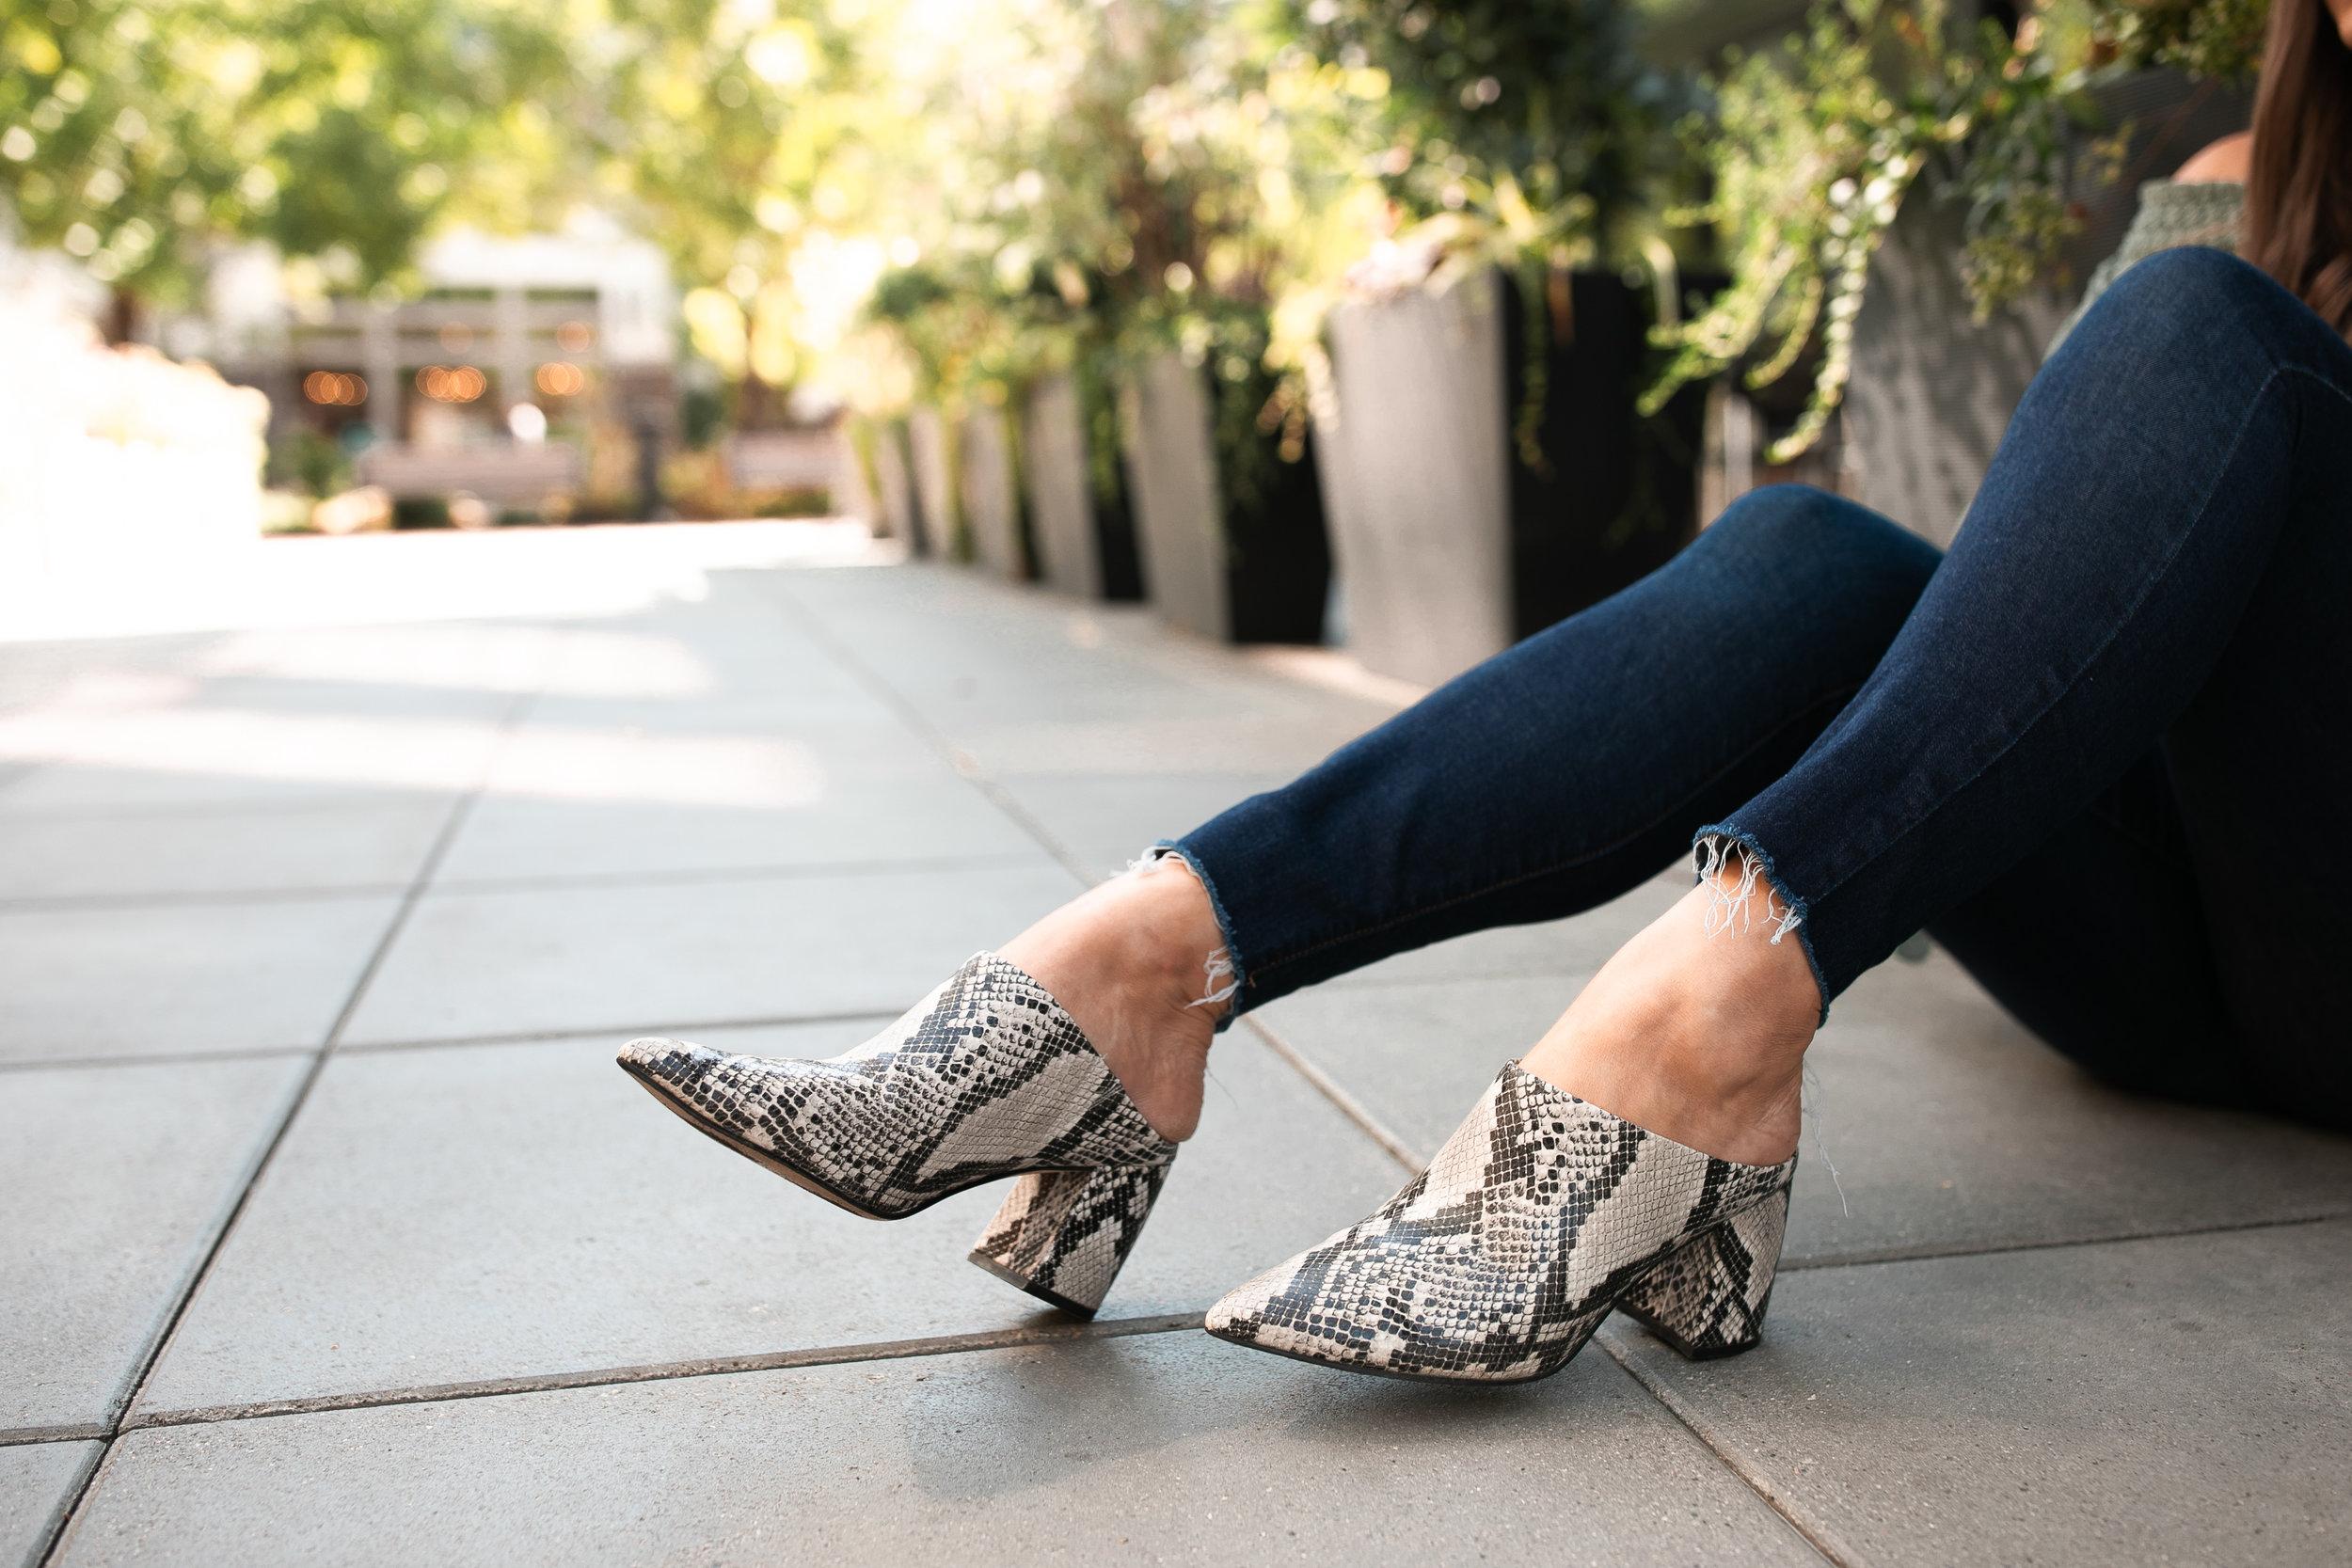 Snake Skin Booties for Fall @stylebyjulianne